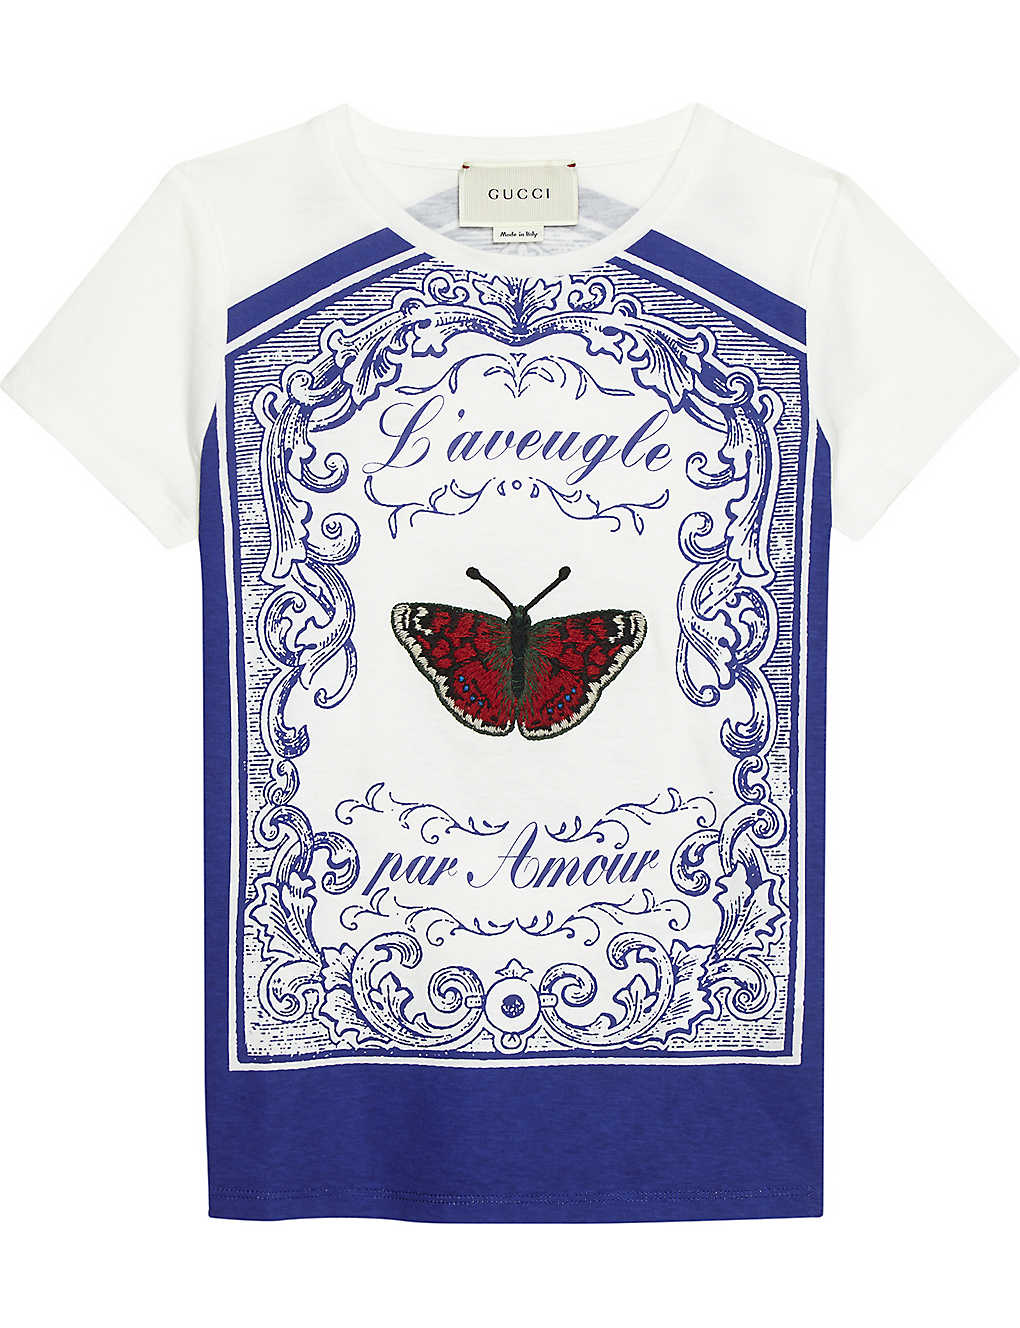 5d2113db1c80 GUCCI - Baroque butterfly cotton T-shirt 4-12 years | Selfridges.com